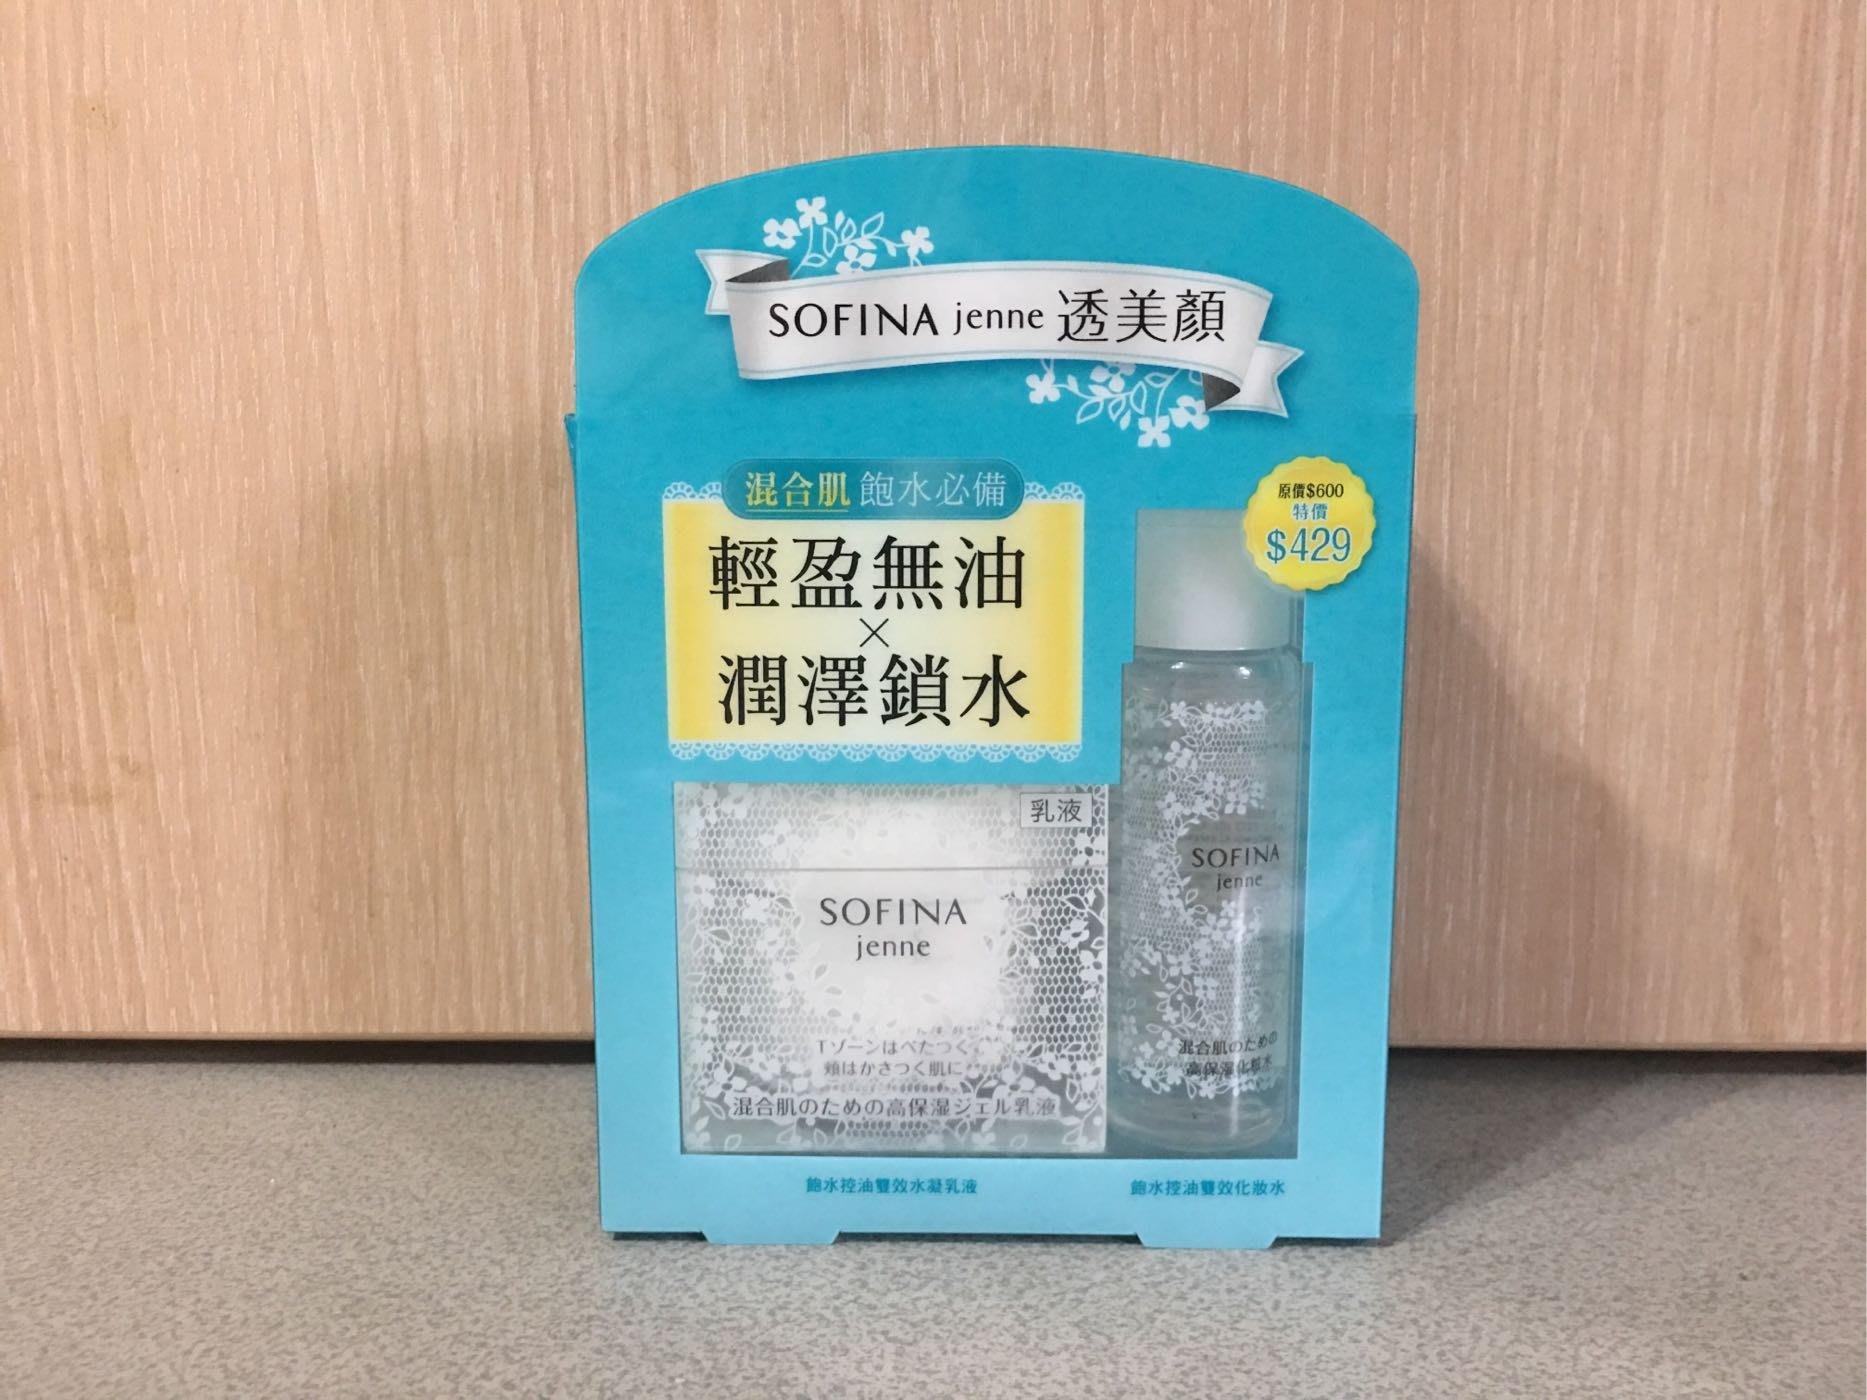 SOFINA 蘇菲娜  透美顏 飽水控油雙效水凝乳液 + 飽水控油雙效化妝水30ML